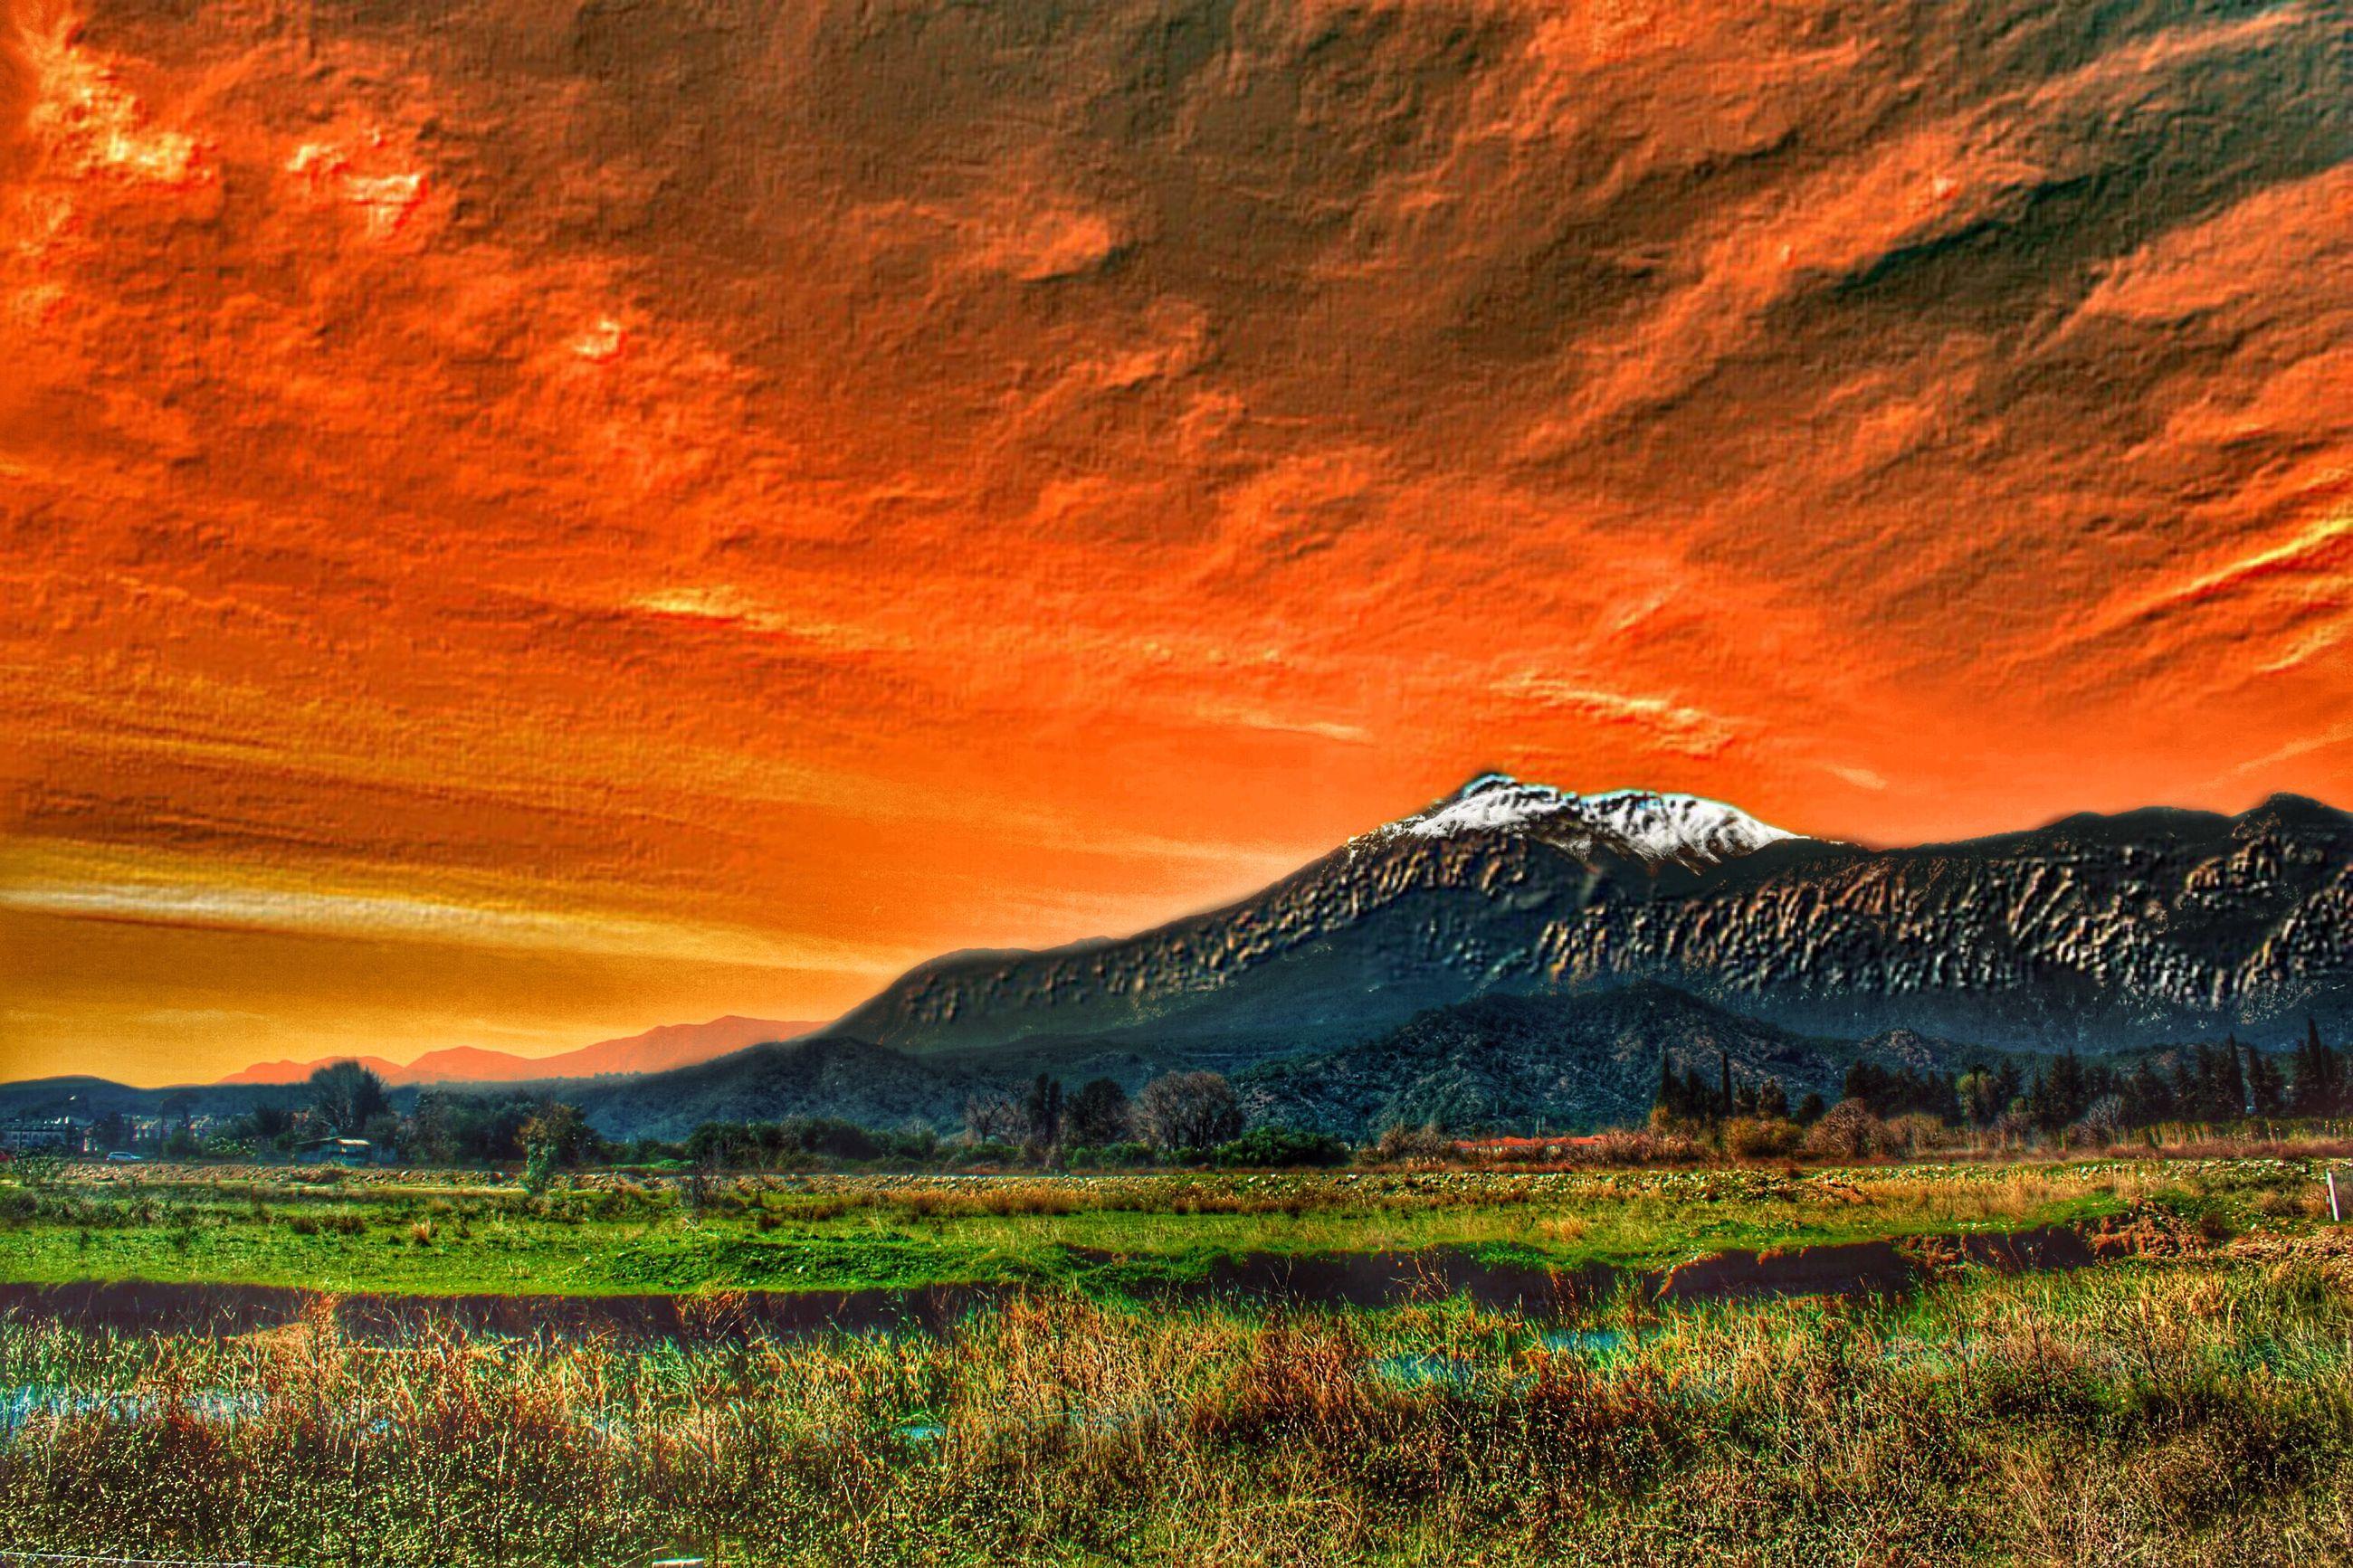 tranquil scene, scenics, sunset, tranquility, beauty in nature, landscape, orange color, mountain, sky, grass, nature, idyllic, field, cloud - sky, non-urban scene, mountain range, dramatic sky, plant, remote, cloud